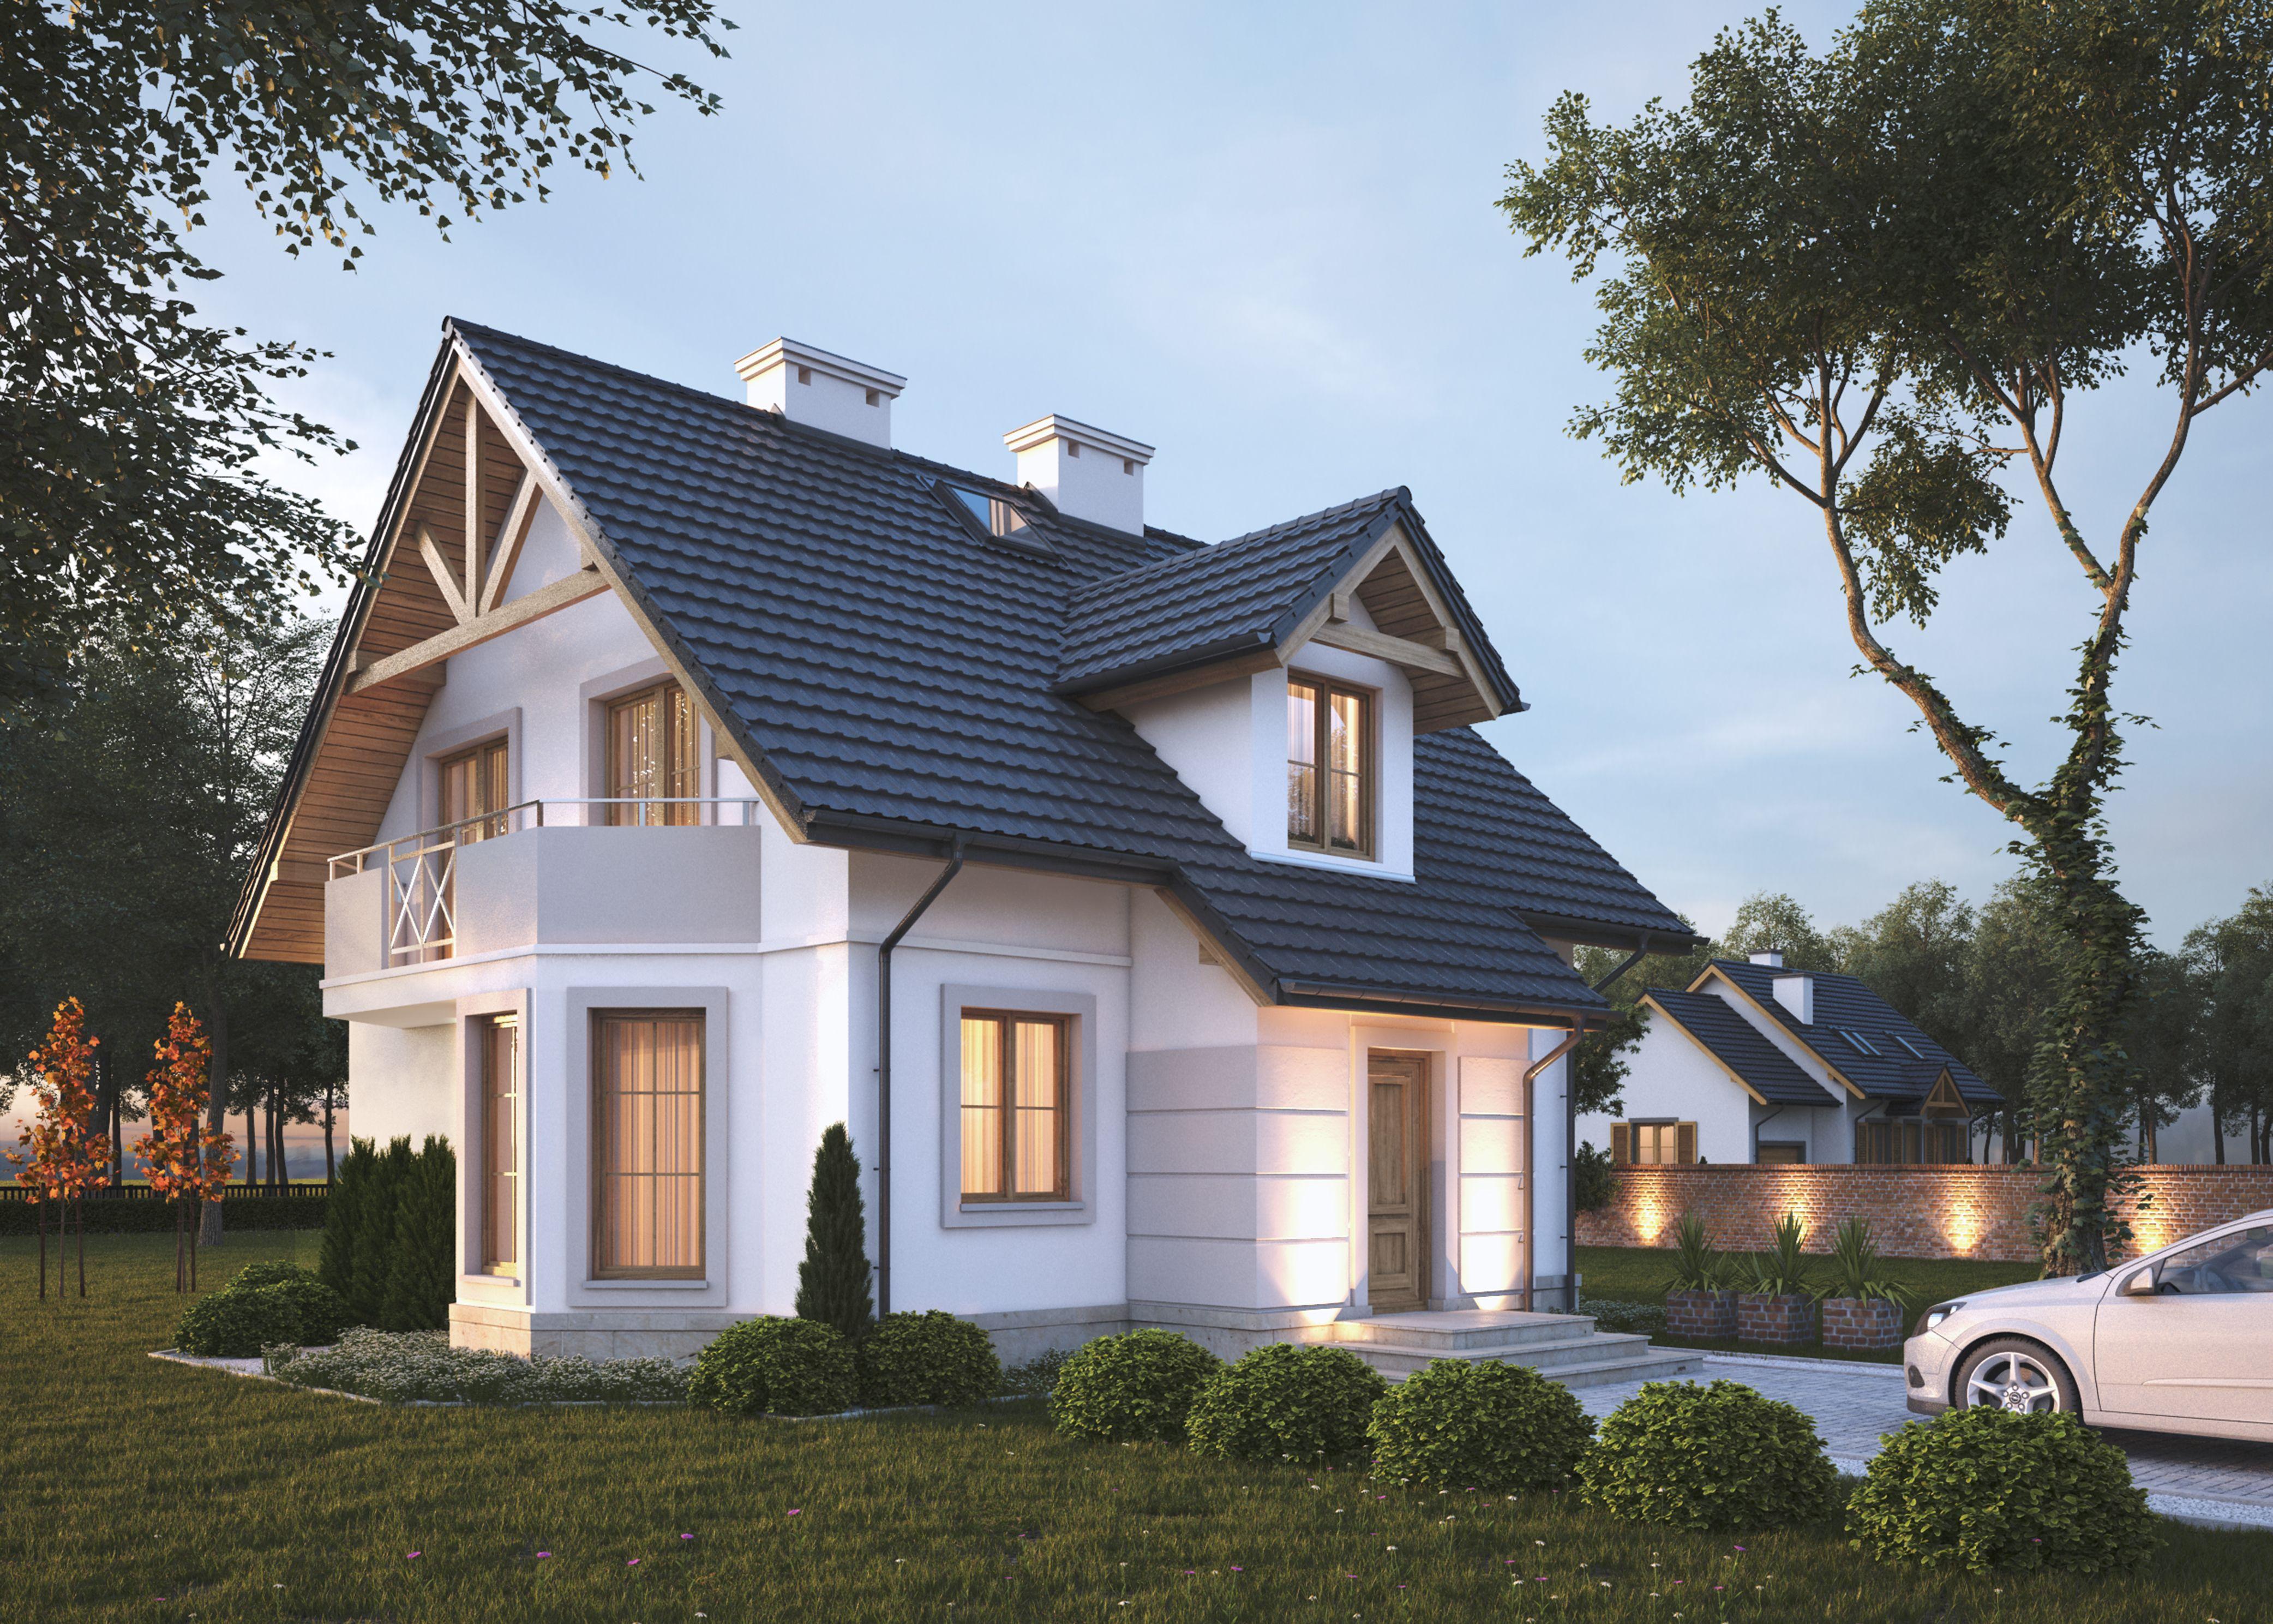 pin von lk projekt auf ma e domy tradycyjne pinterest house house floor plans und home. Black Bedroom Furniture Sets. Home Design Ideas